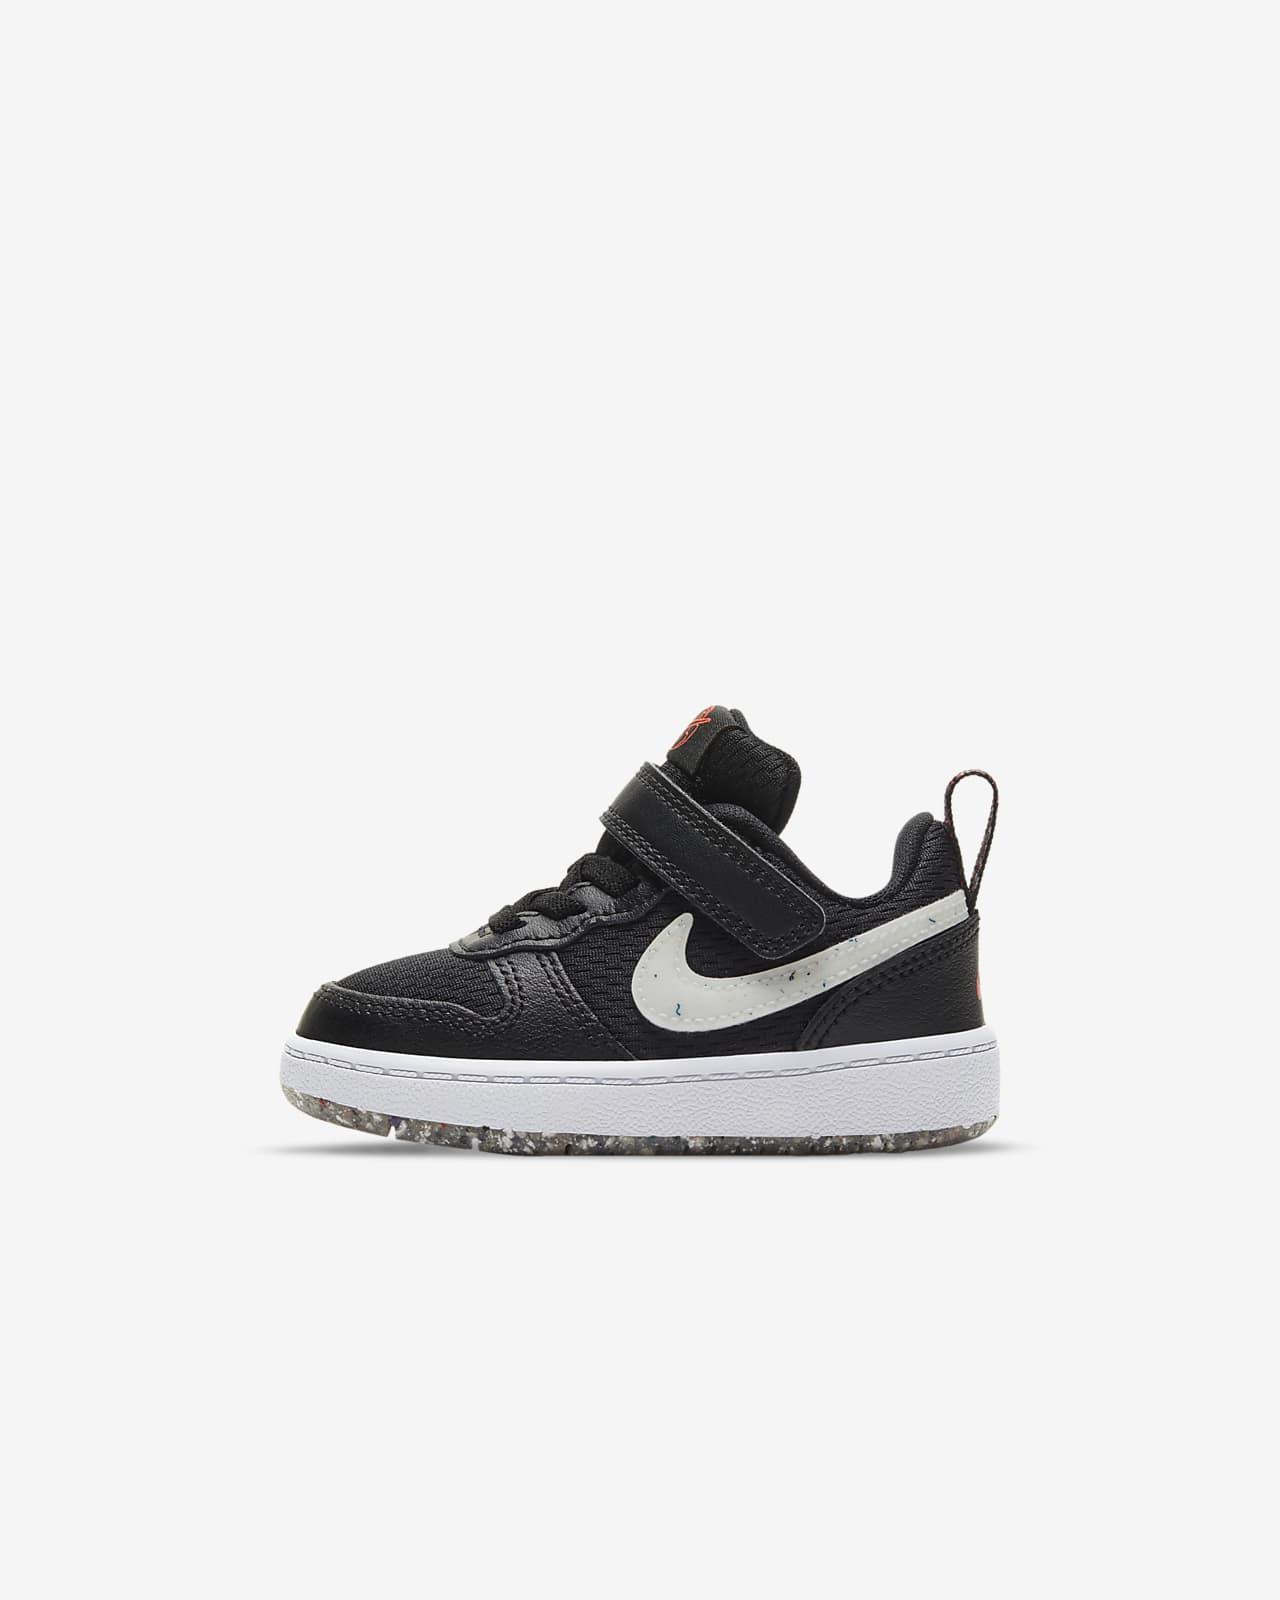 Nike Court Borough Low 2 SE (TDV) 婴童运动童鞋